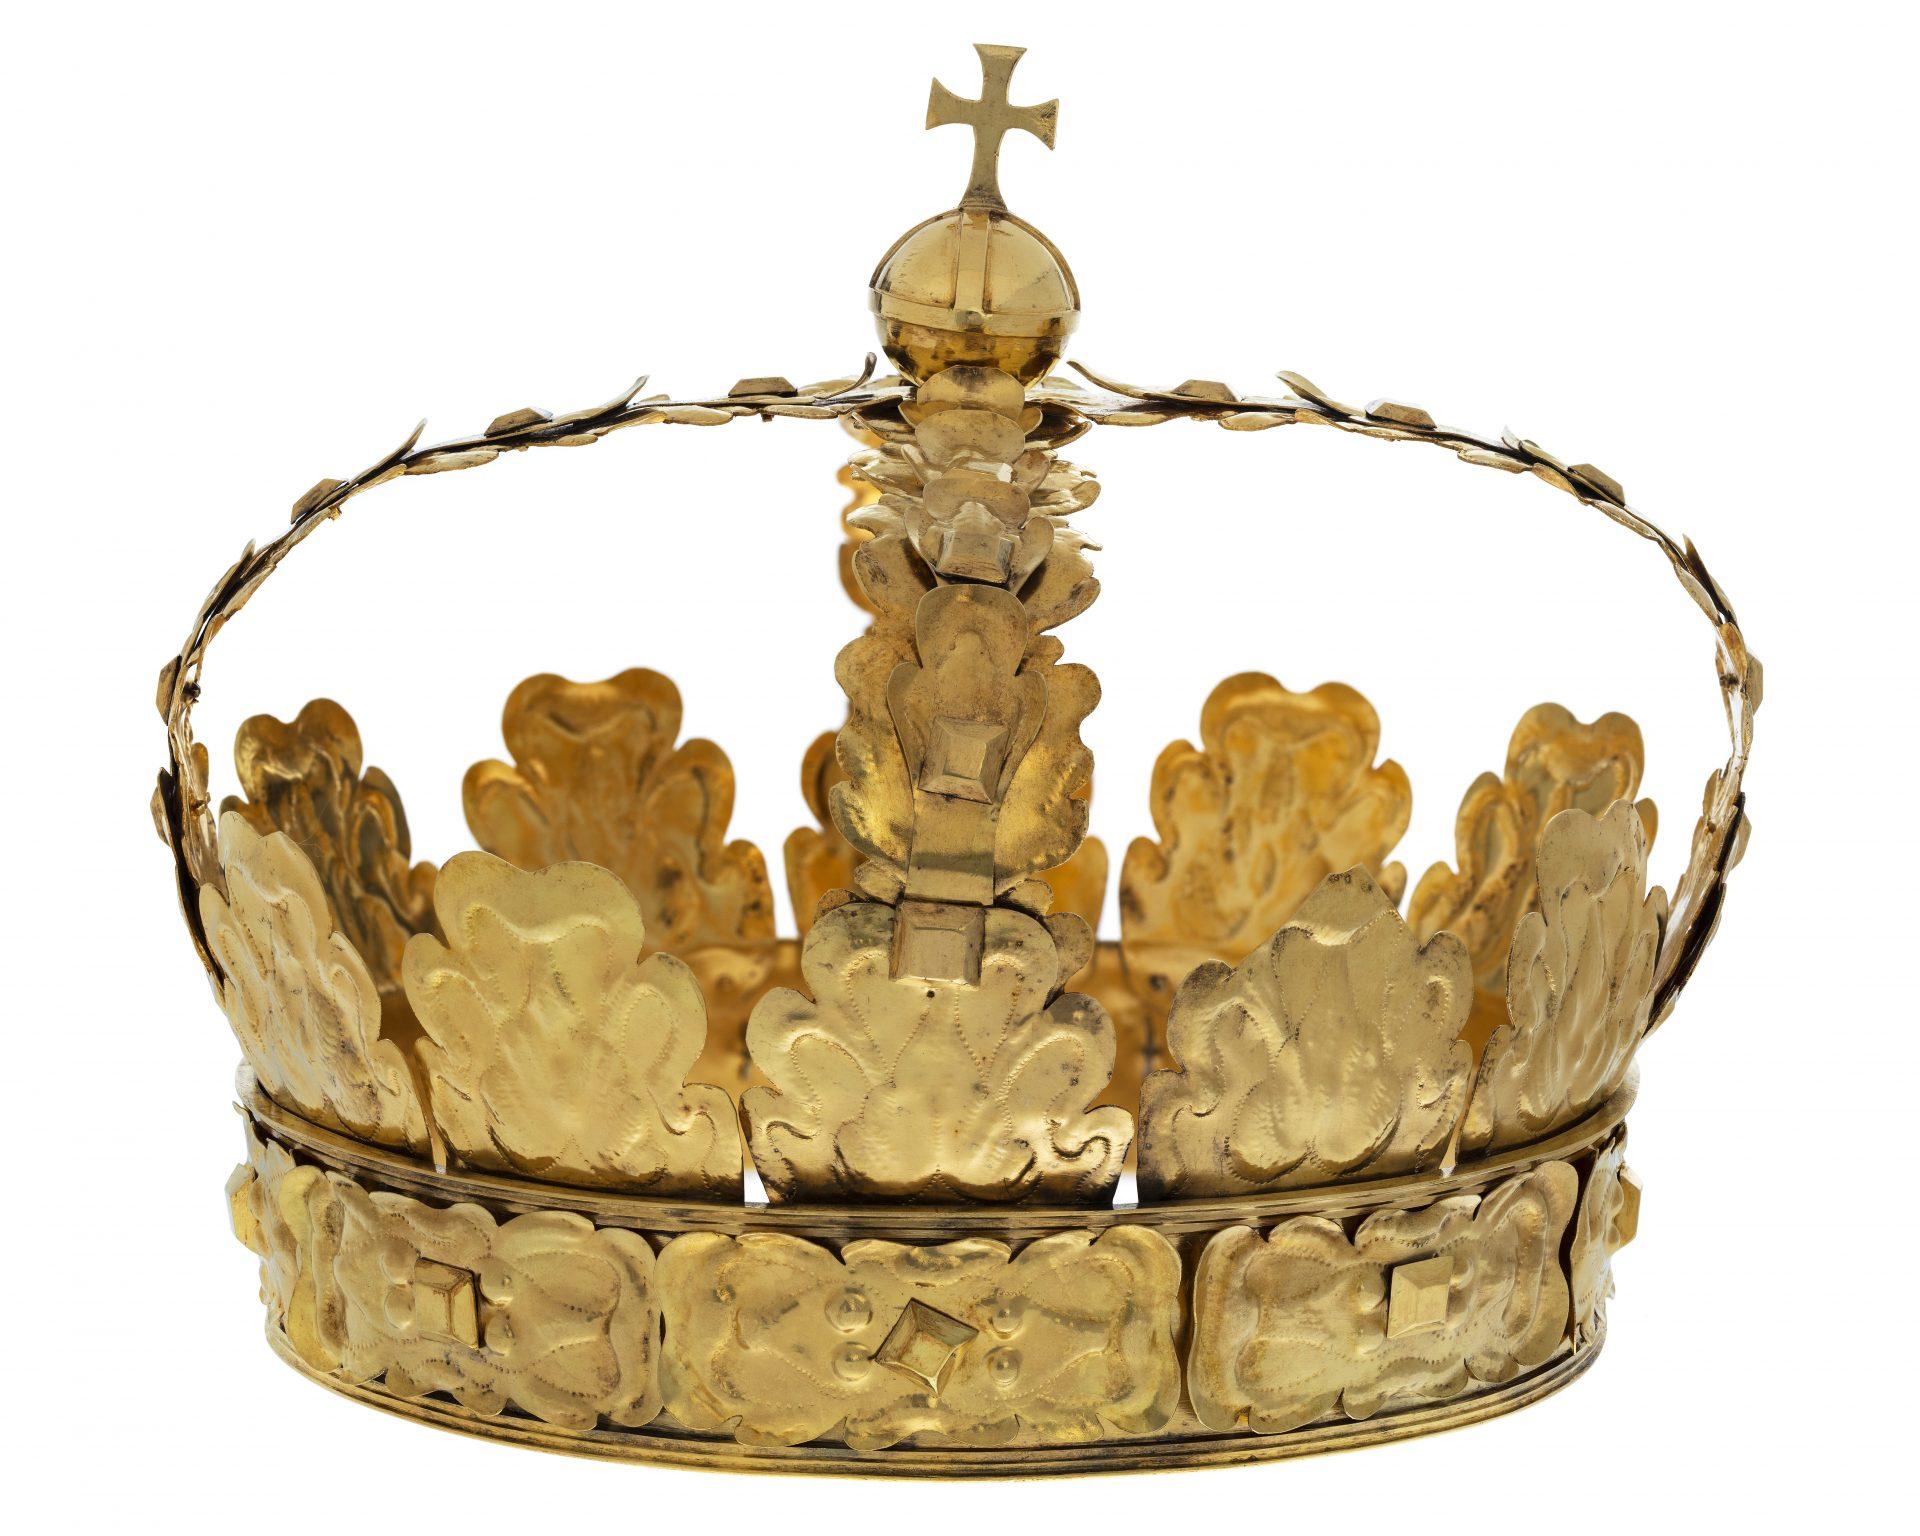 Gold-colored crown. Karl X Gustav's funeral crown.